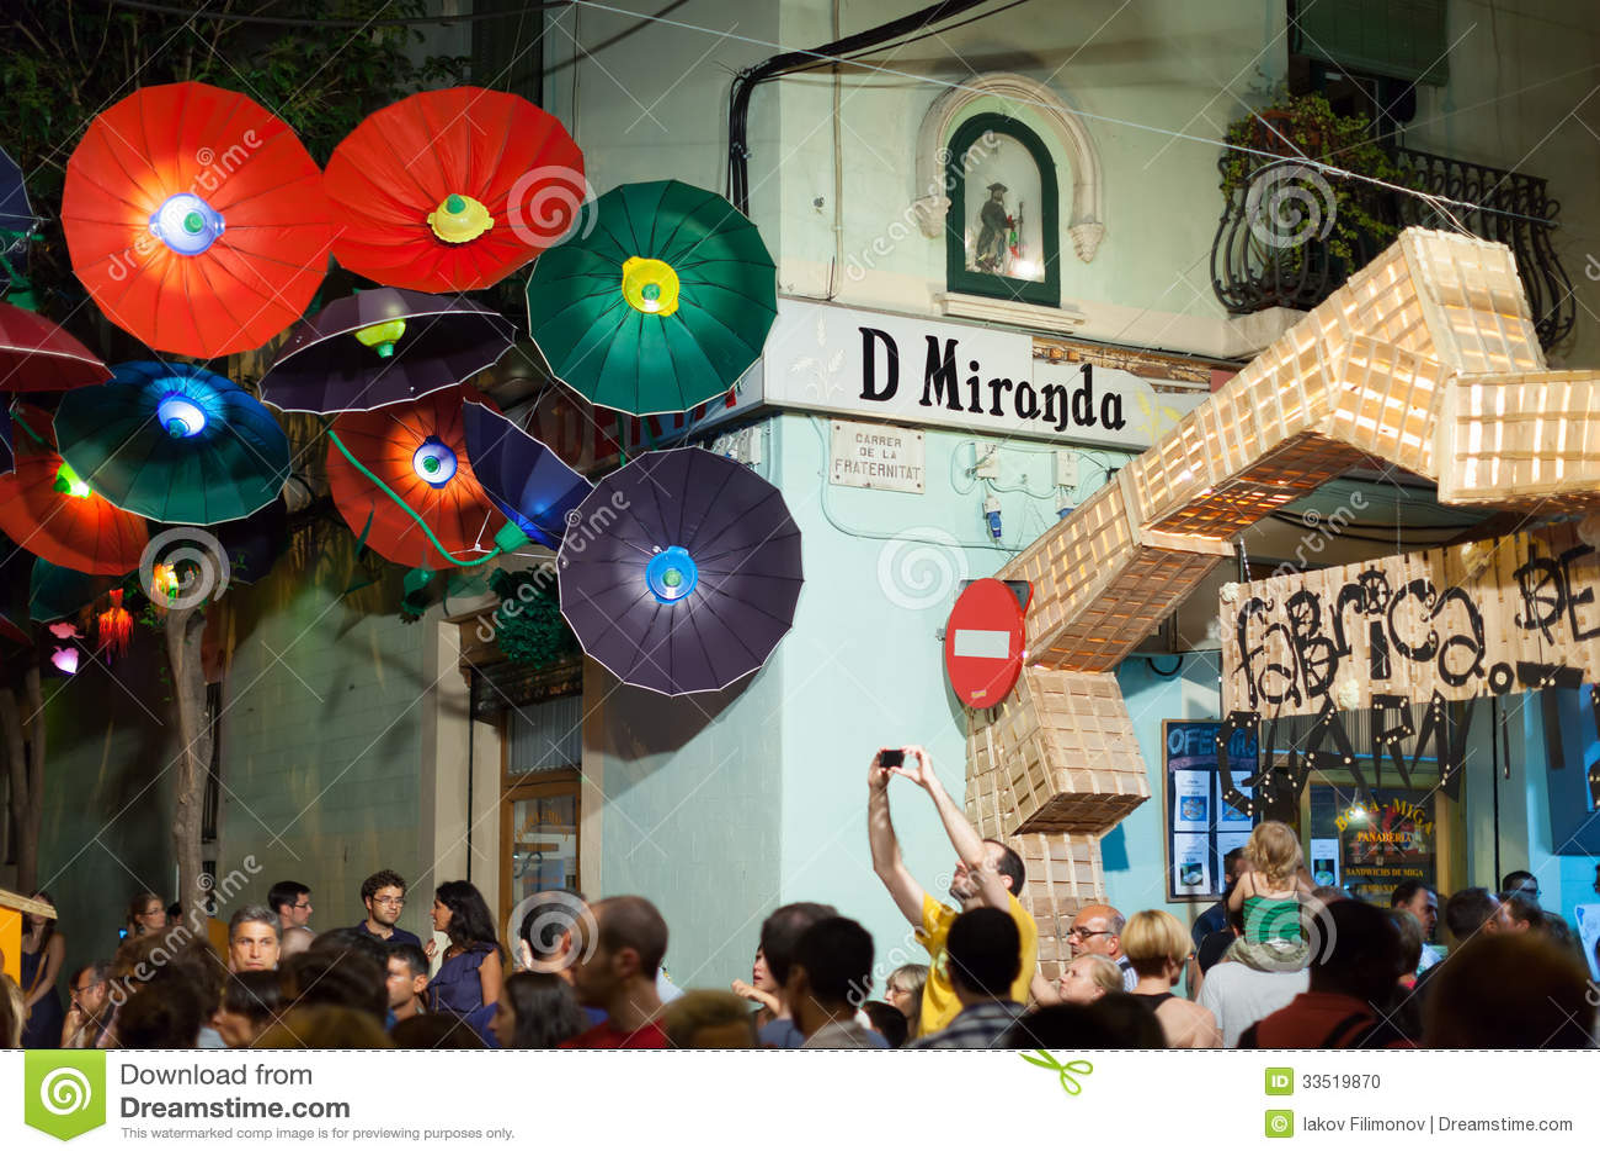 Decorations In Spain Gracia Festival Decorations In Night Barcelona Spain Editorial